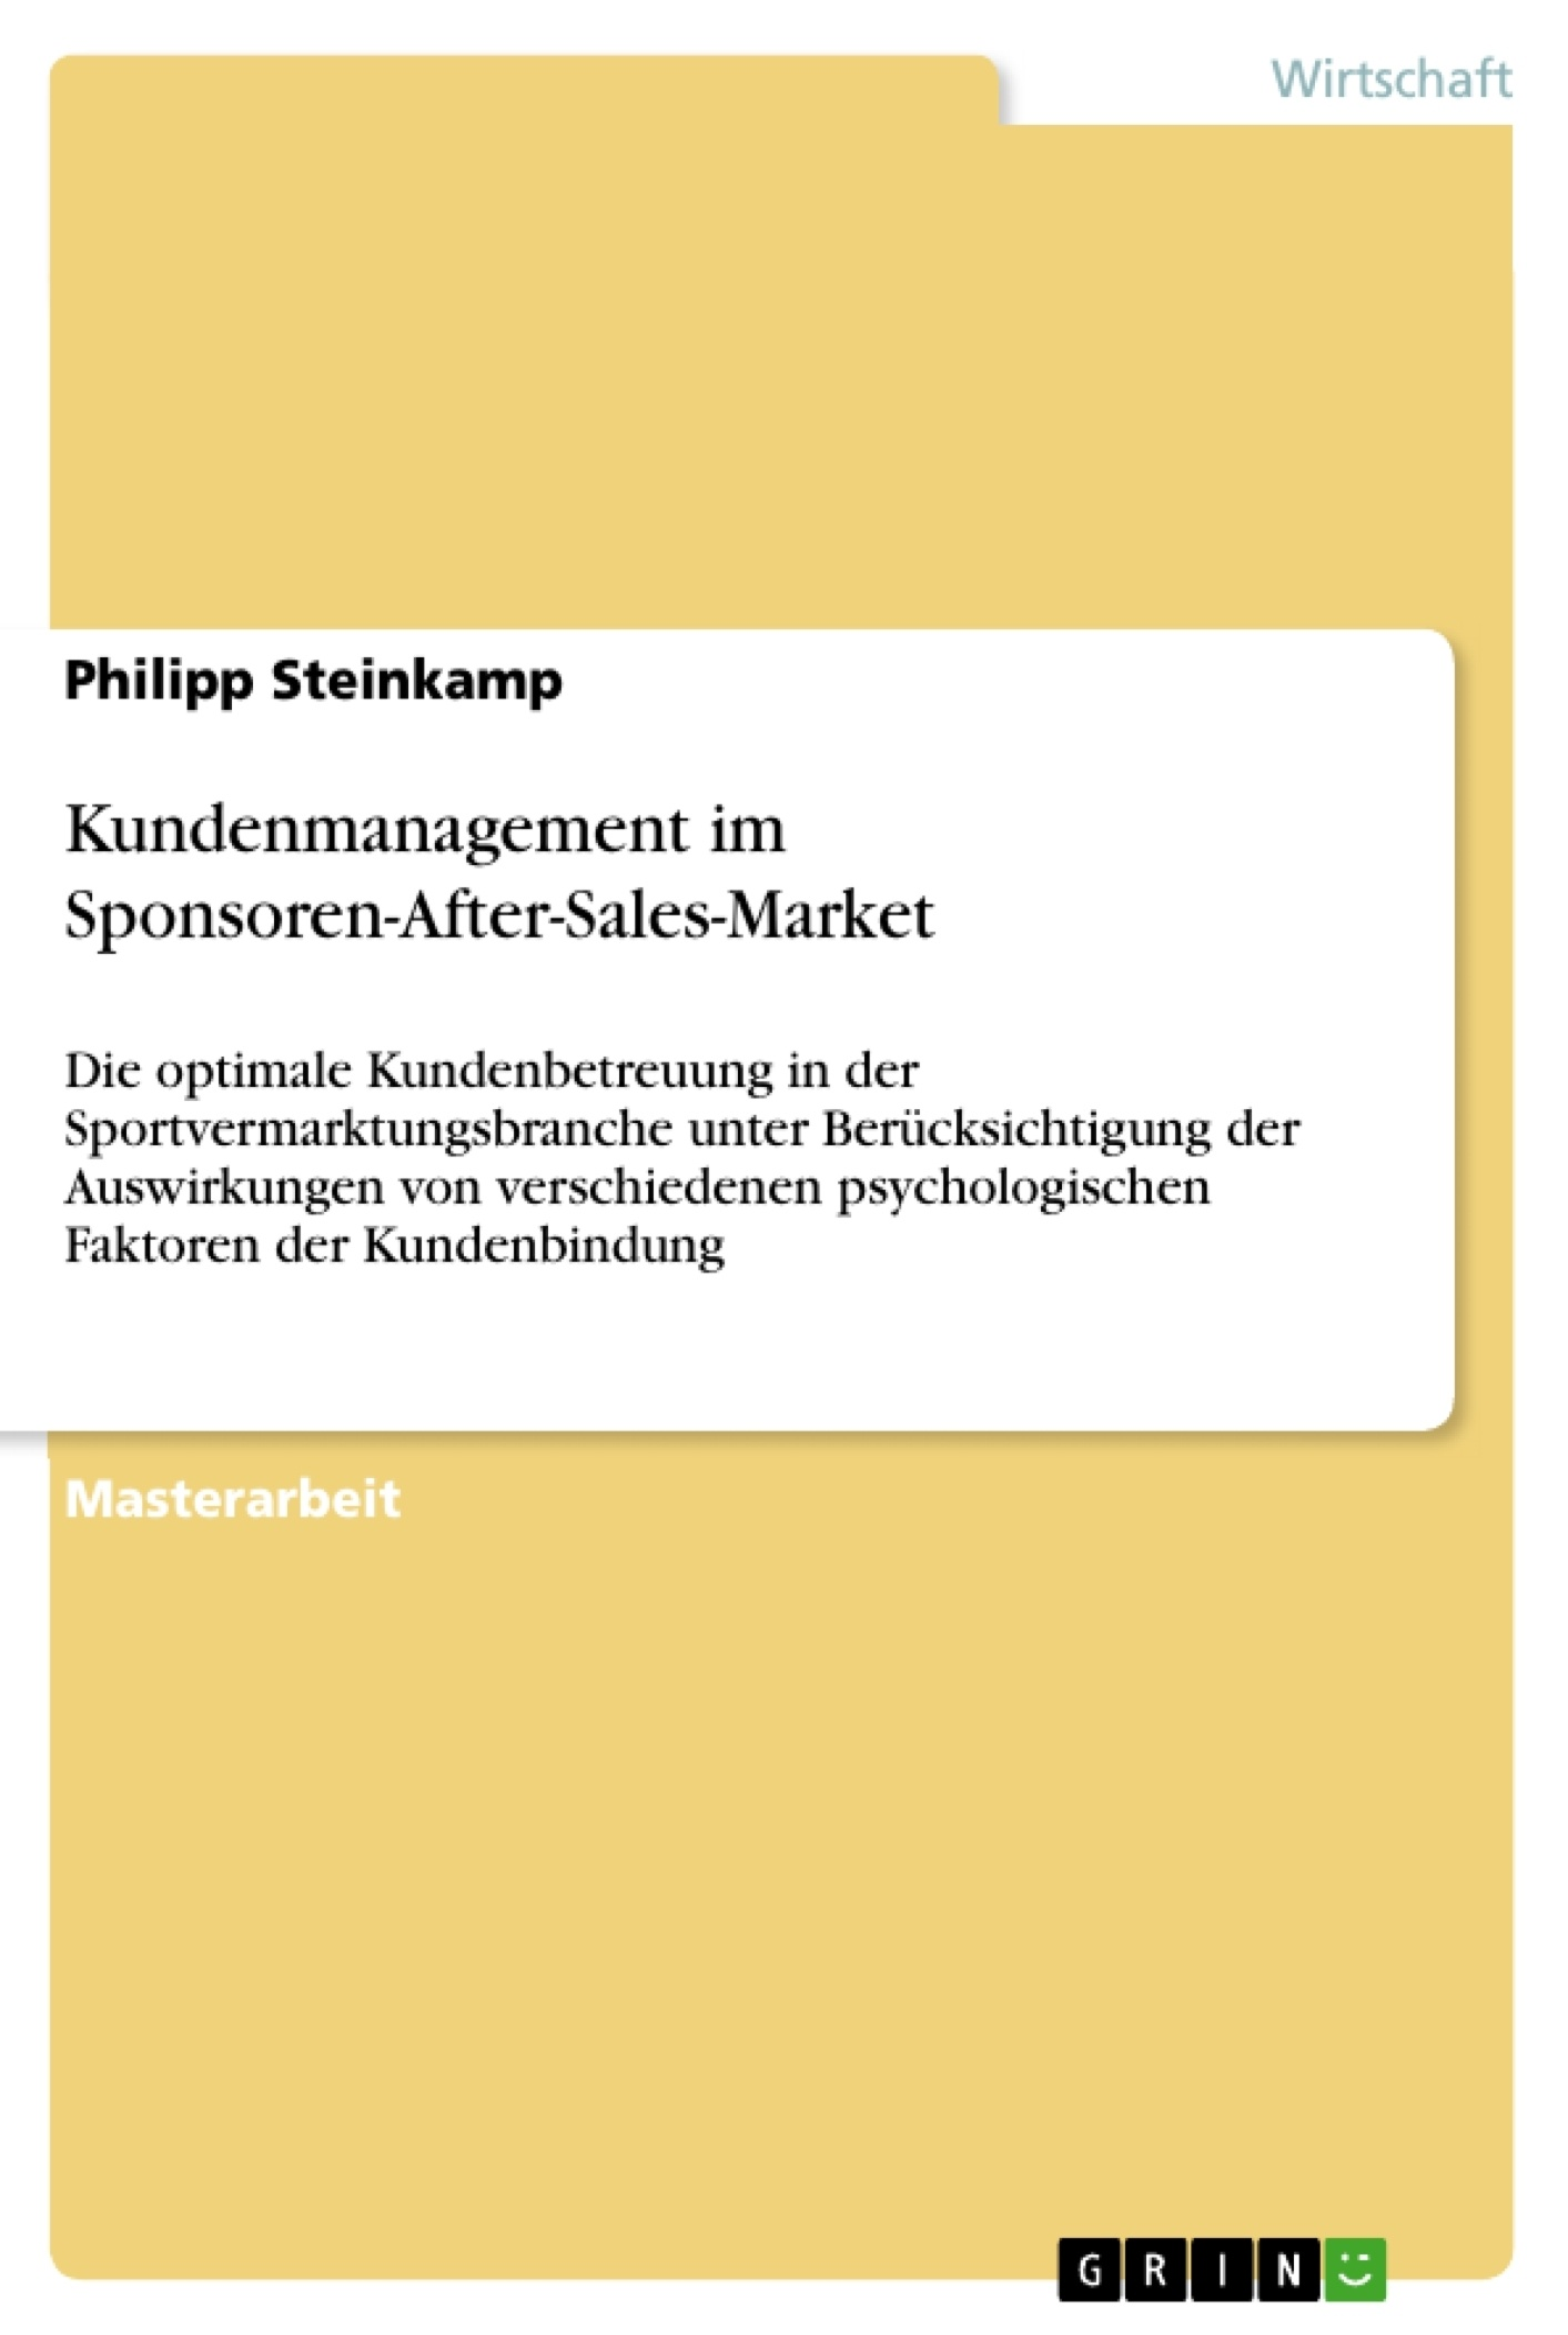 Titel: Kundenmanagement im Sponsoren-After-Sales-Market